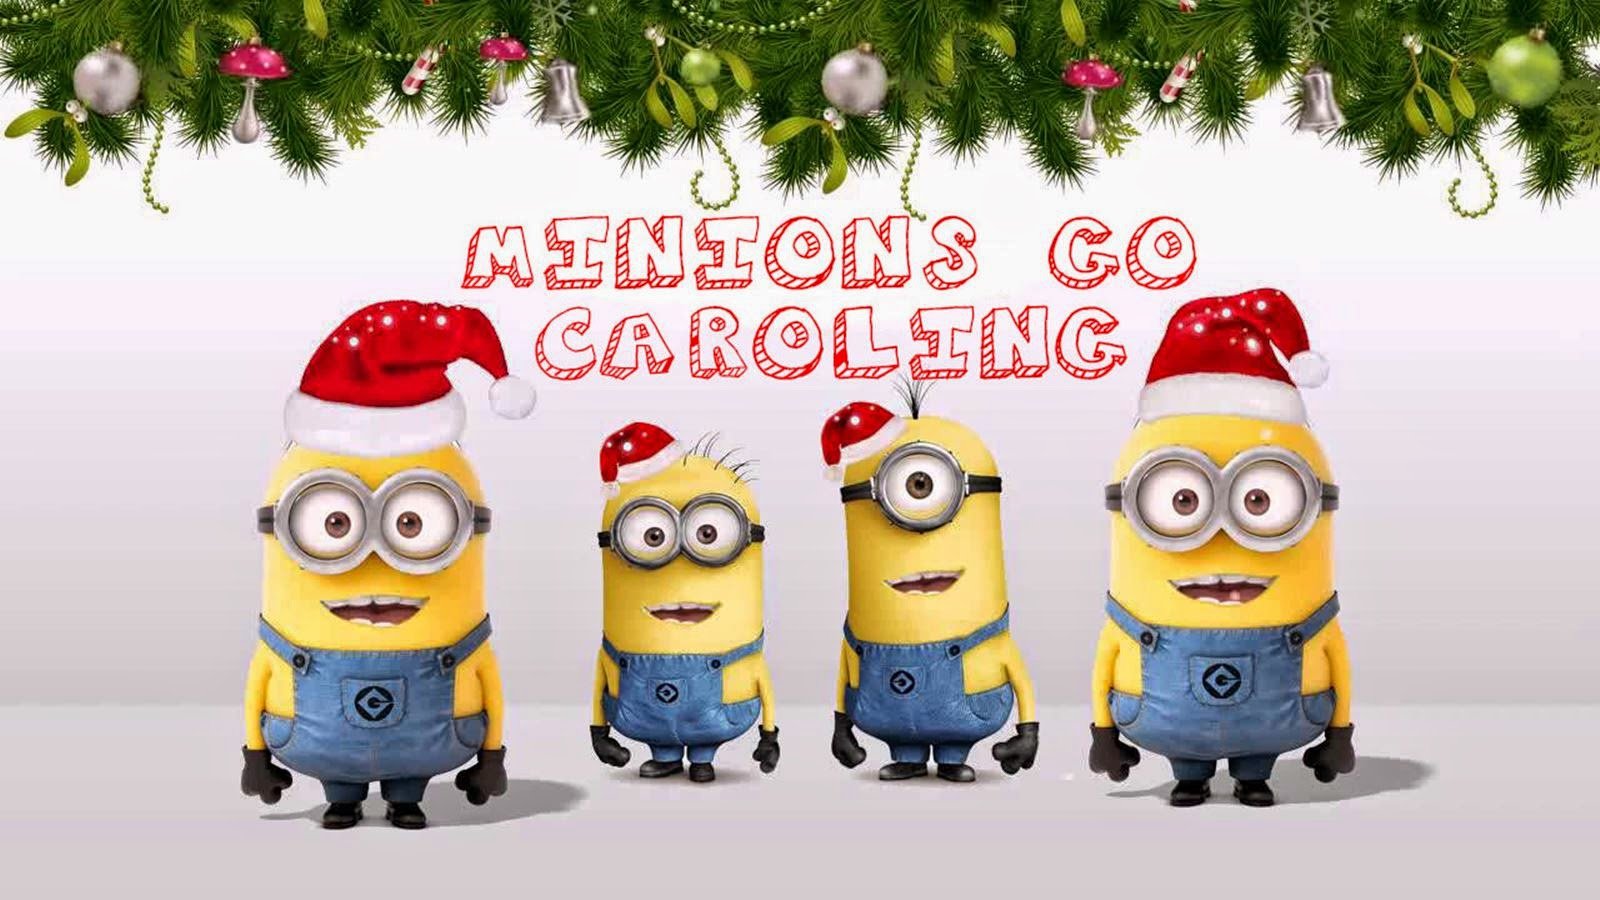 Los Minions cantan villancicos, Minions go caroling